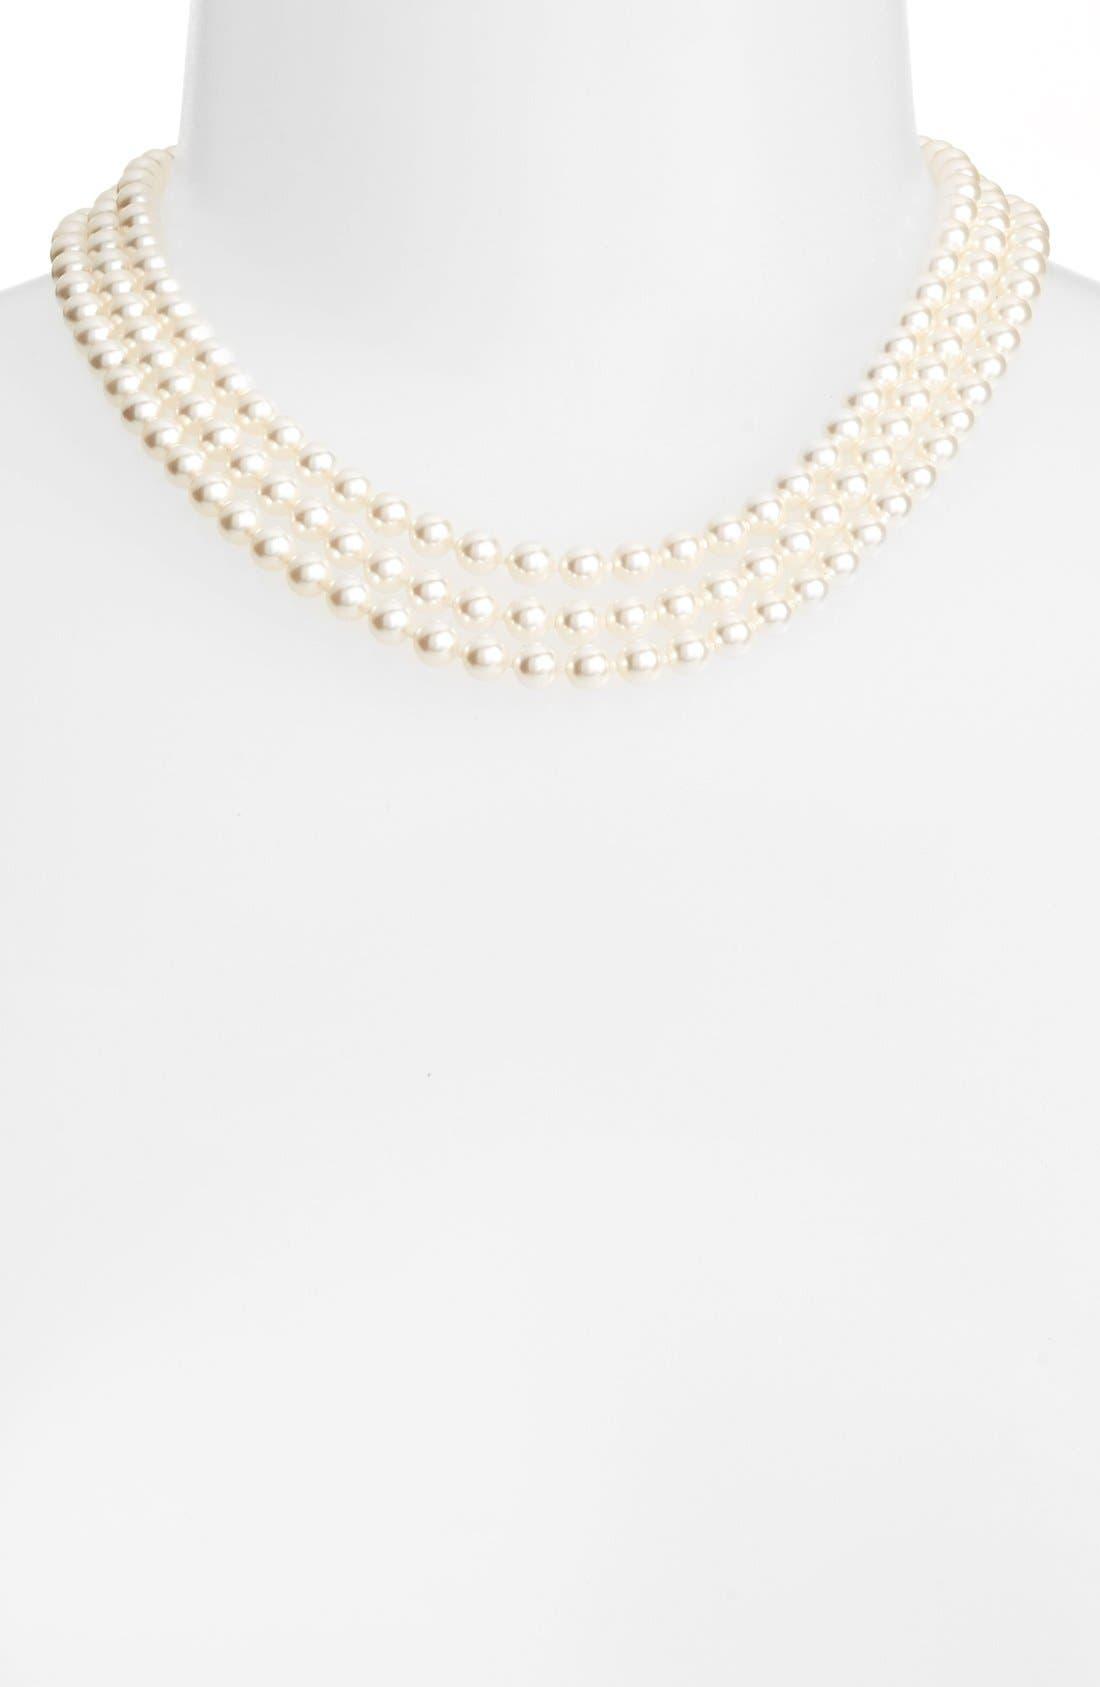 NADRI, Multistrand Imitation Pearl Necklace, Main thumbnail 1, color, IVORY